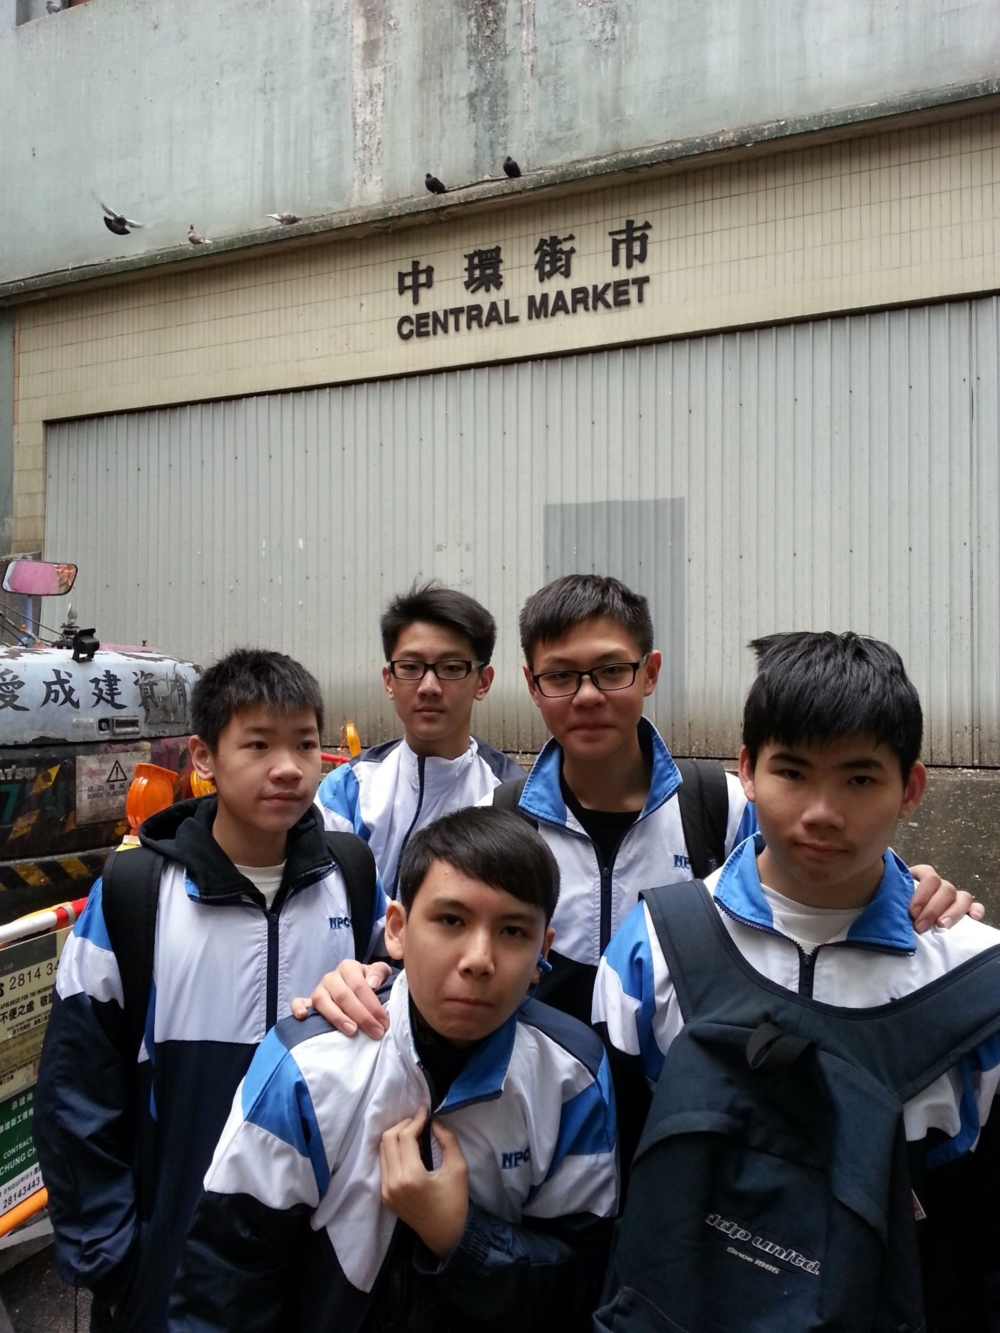 http://www.npc.edu.hk/sites/default/files/17_19.jpg